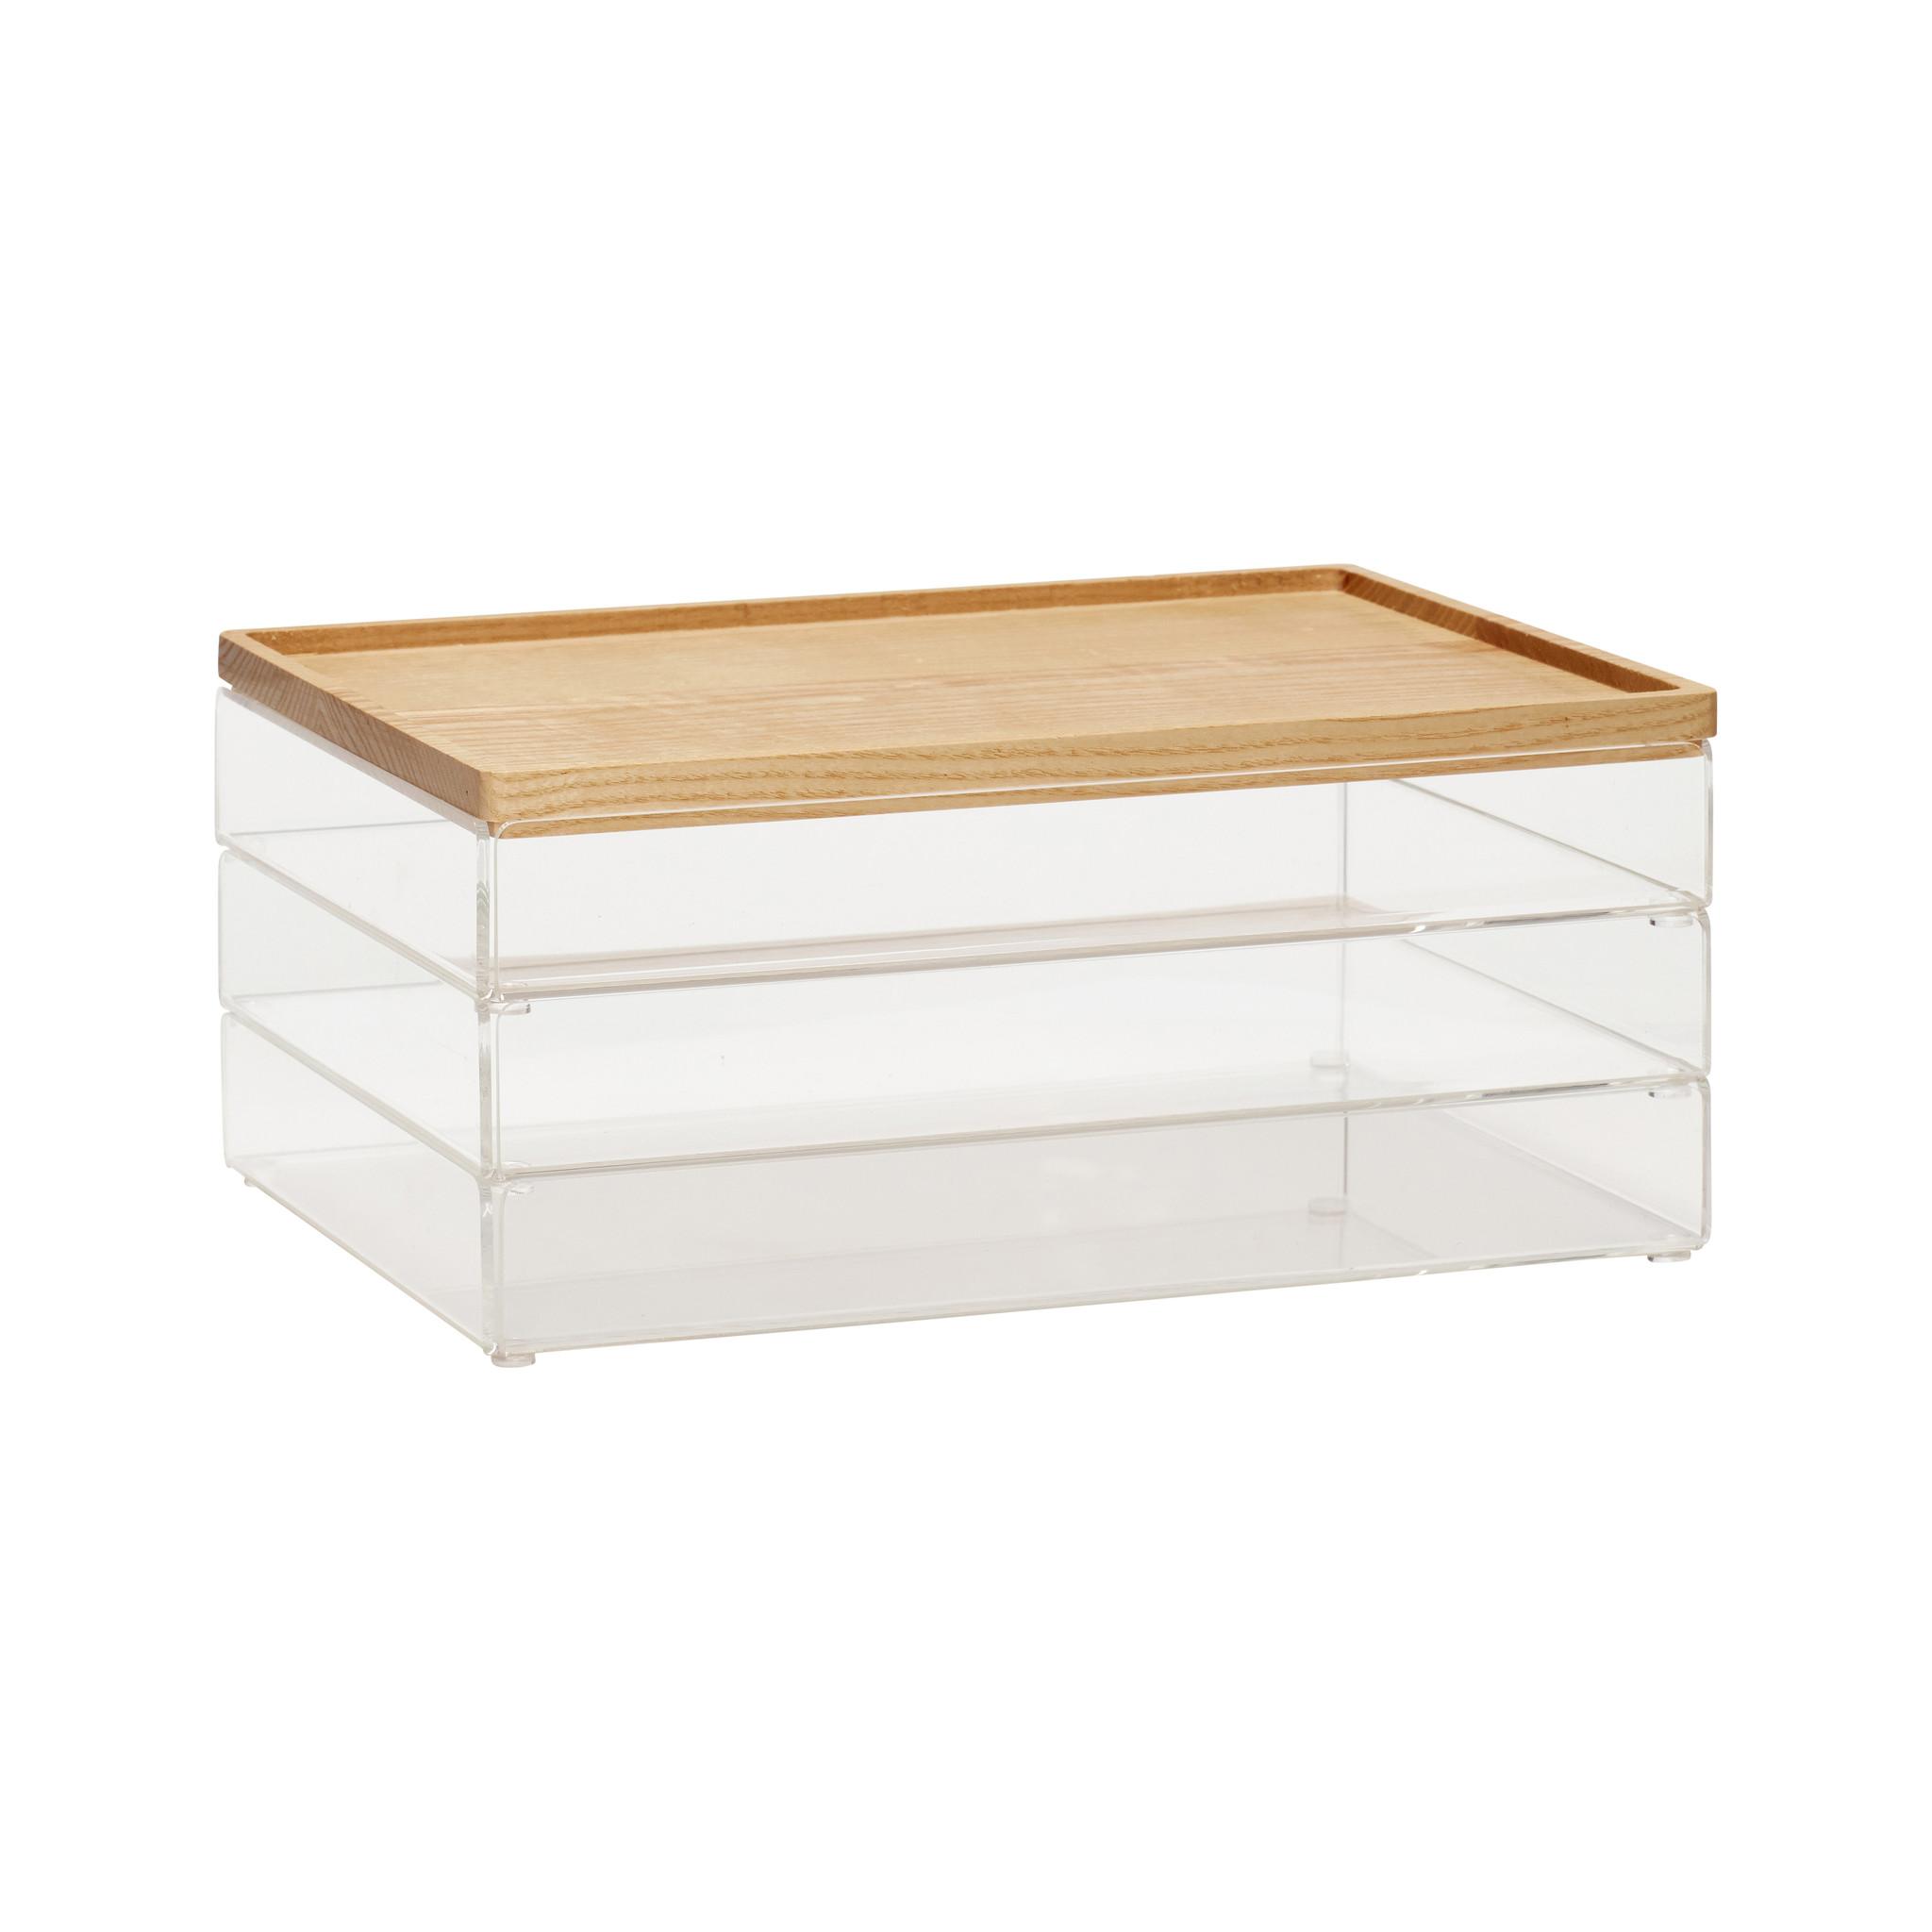 Hubsch Doos met deksel, acryl, transparant / hout, natuur / helder, set van 3-120403-5712772035962